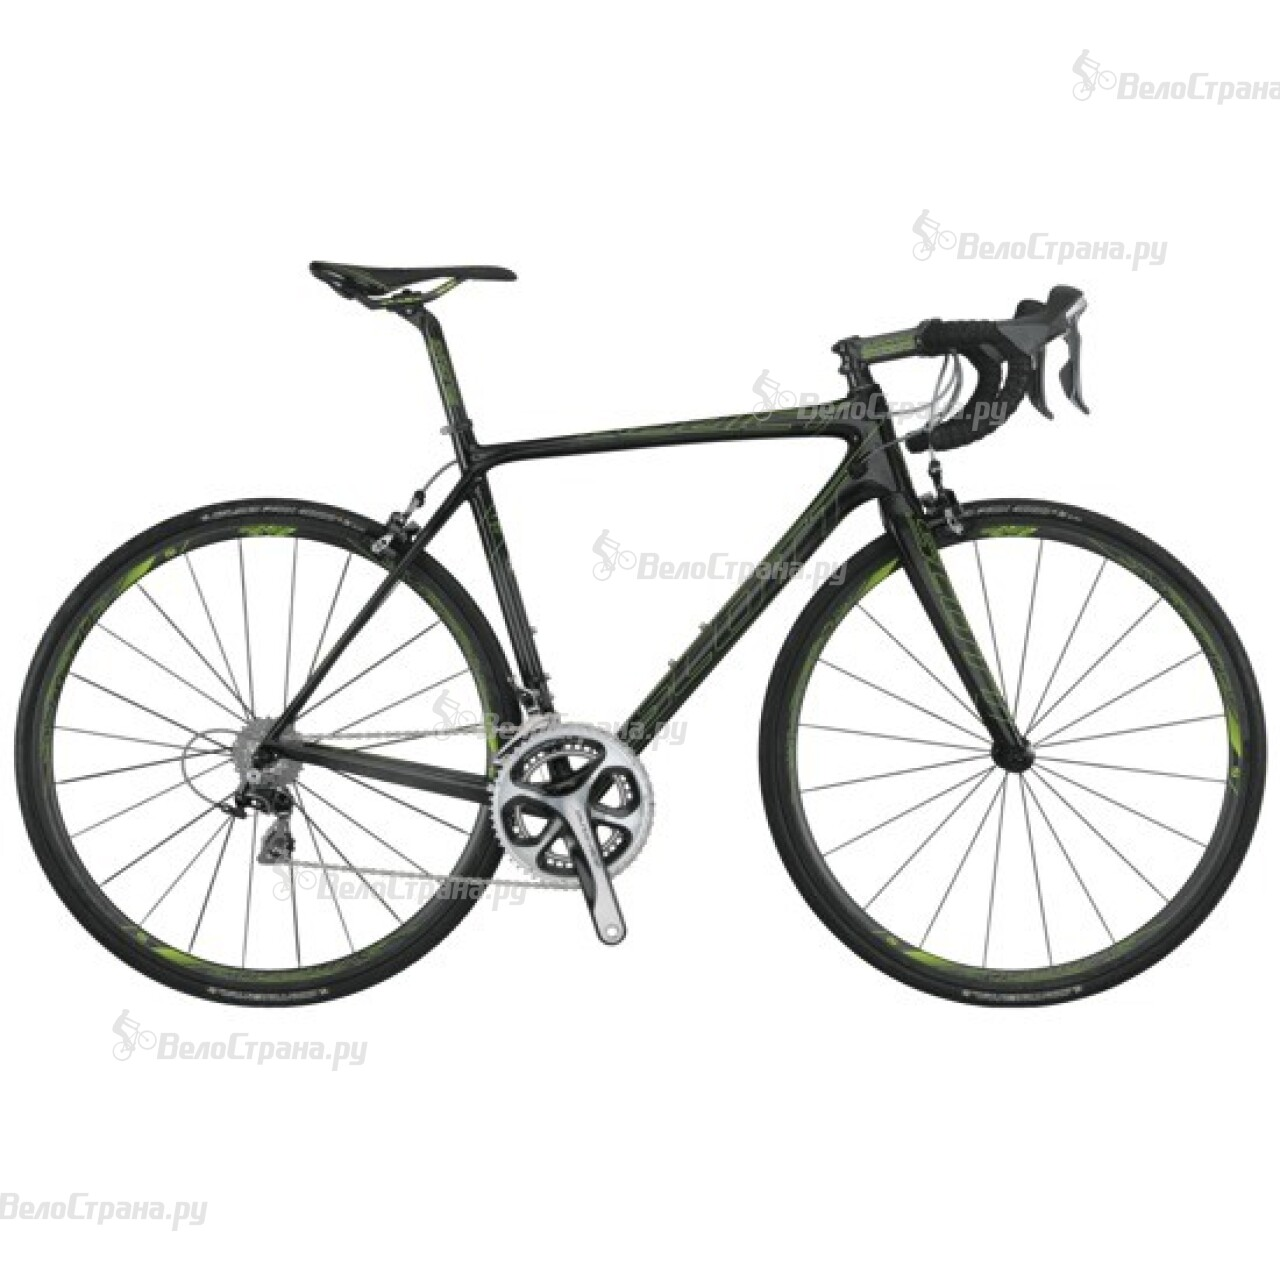 Велосипед Scott Addict Team Issue (2014) scott addict sl compact 2015